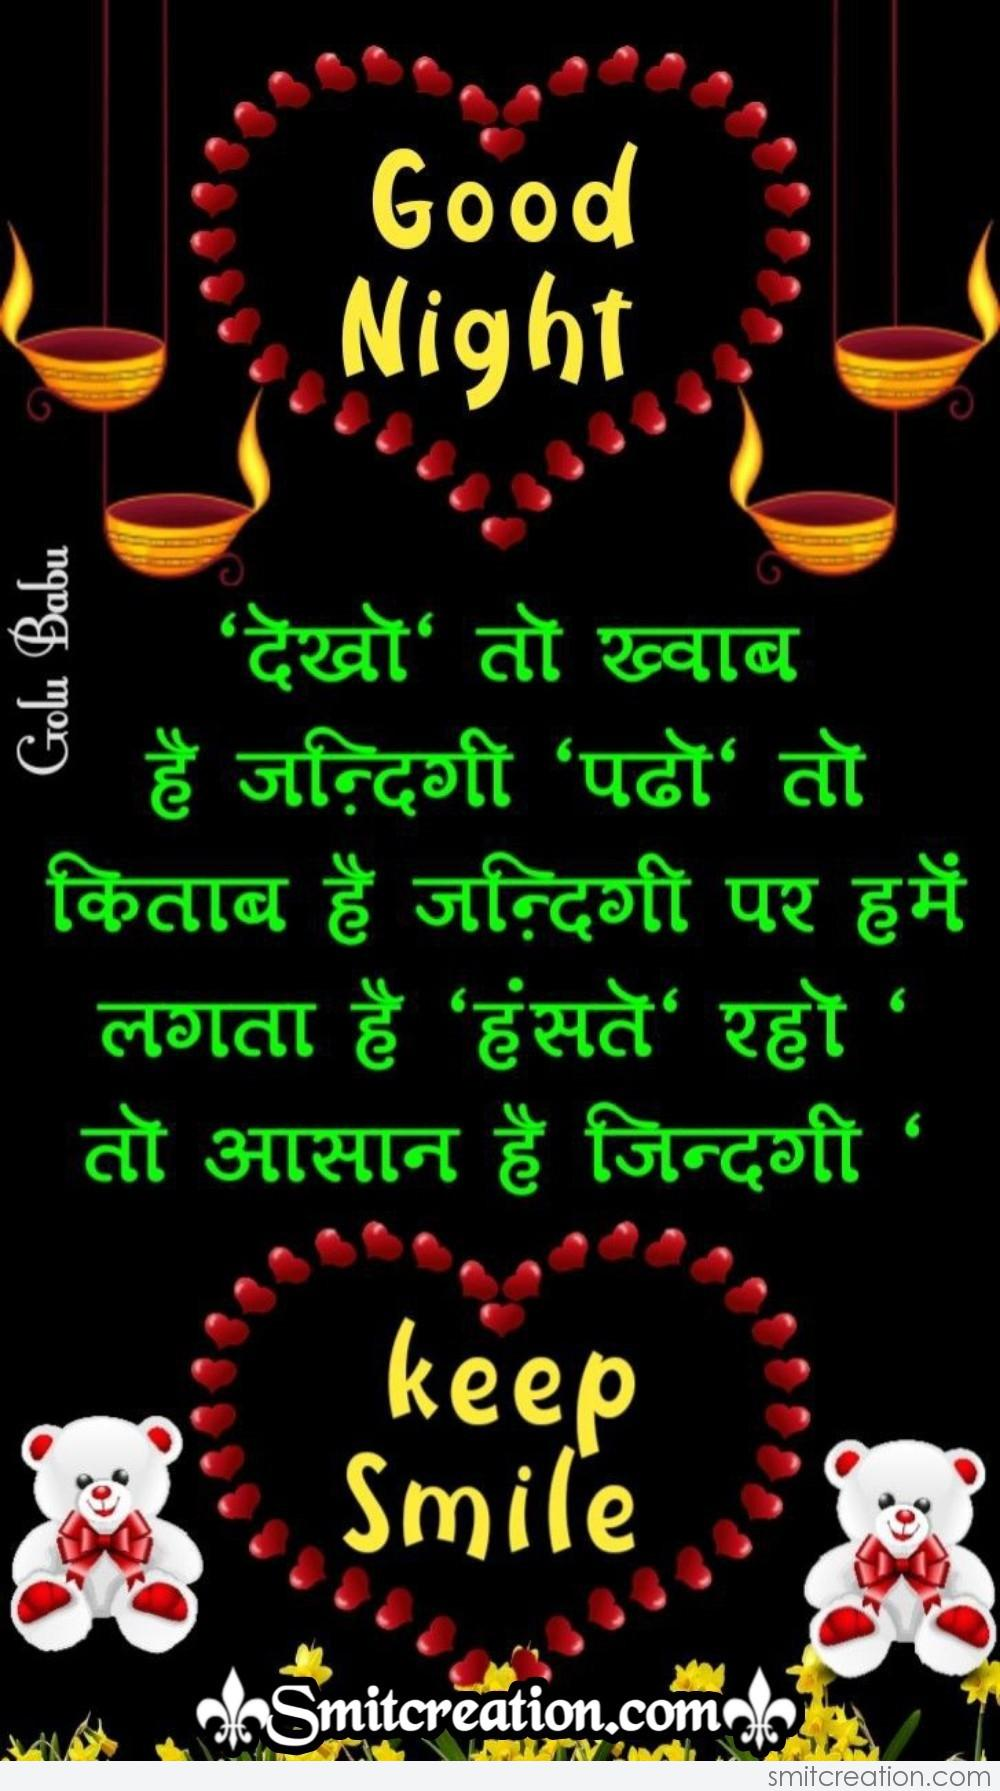 Good Night Shayari (गुड नाईट शायरी) Pictures and